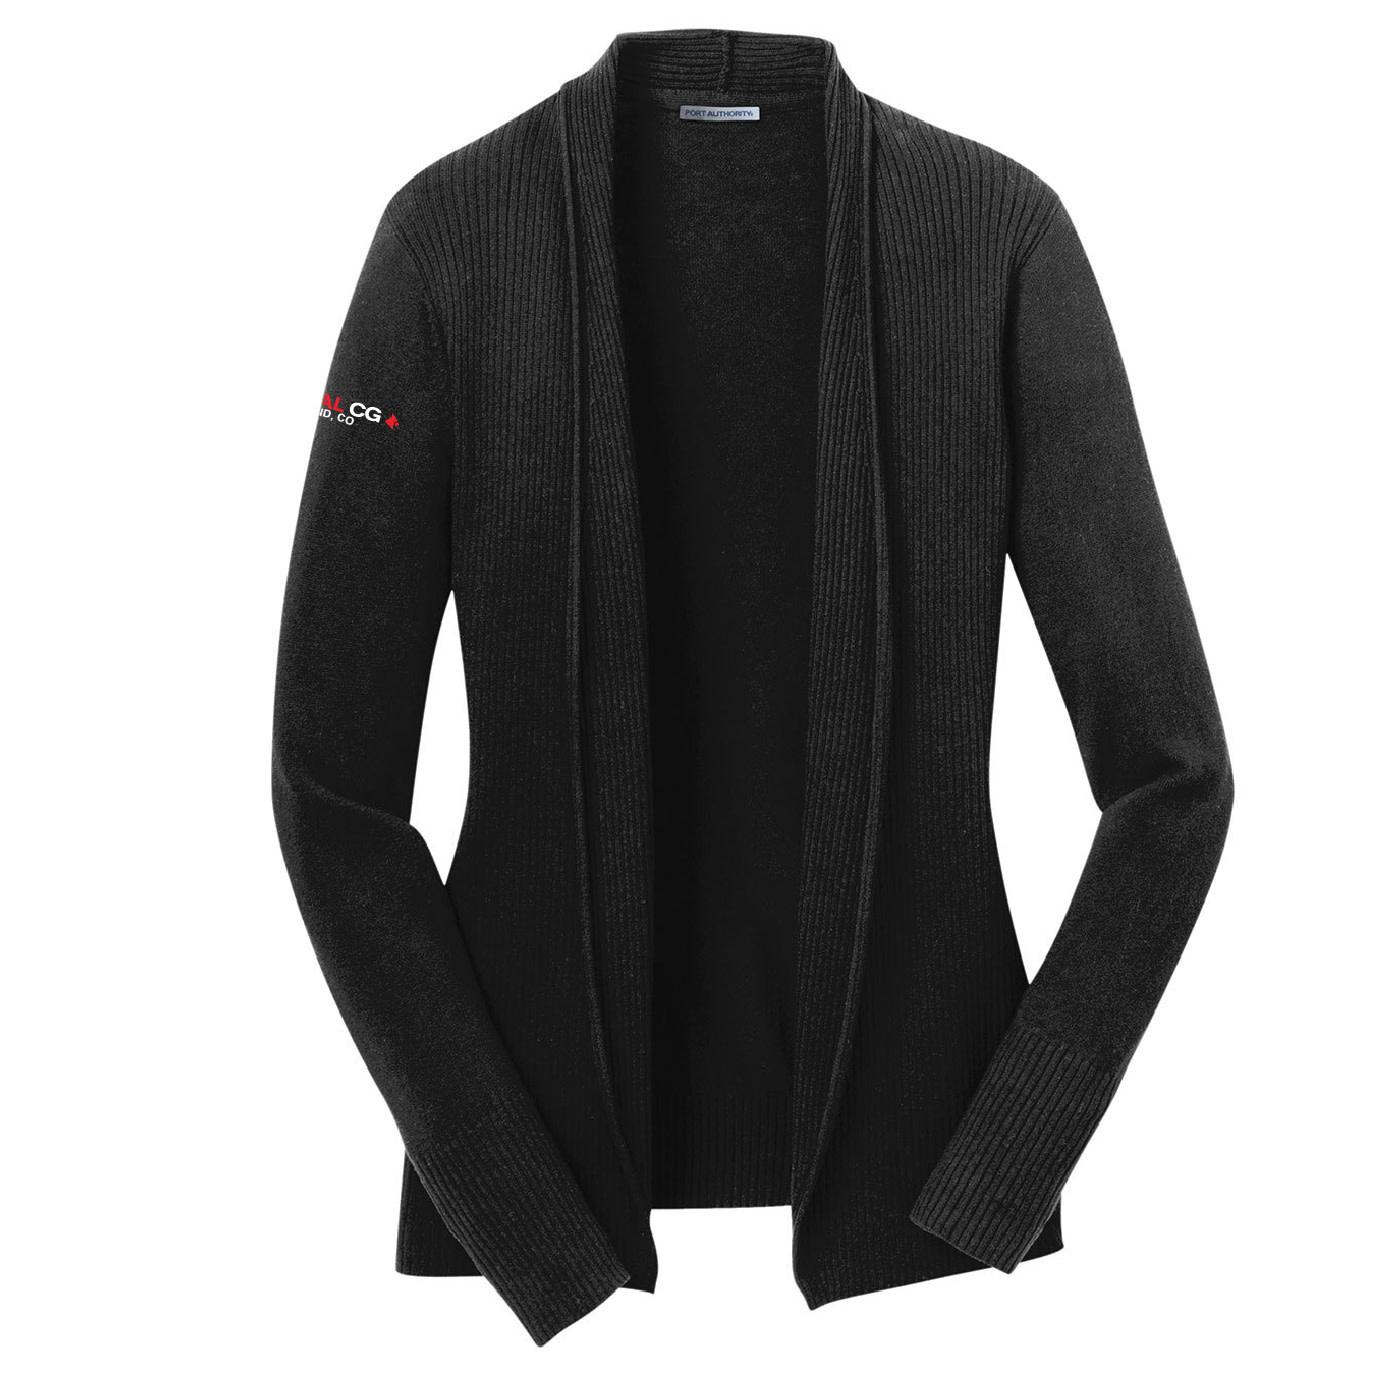 Port Authority Port Authority Ladies Open Front Cardigan Sweater (Black)